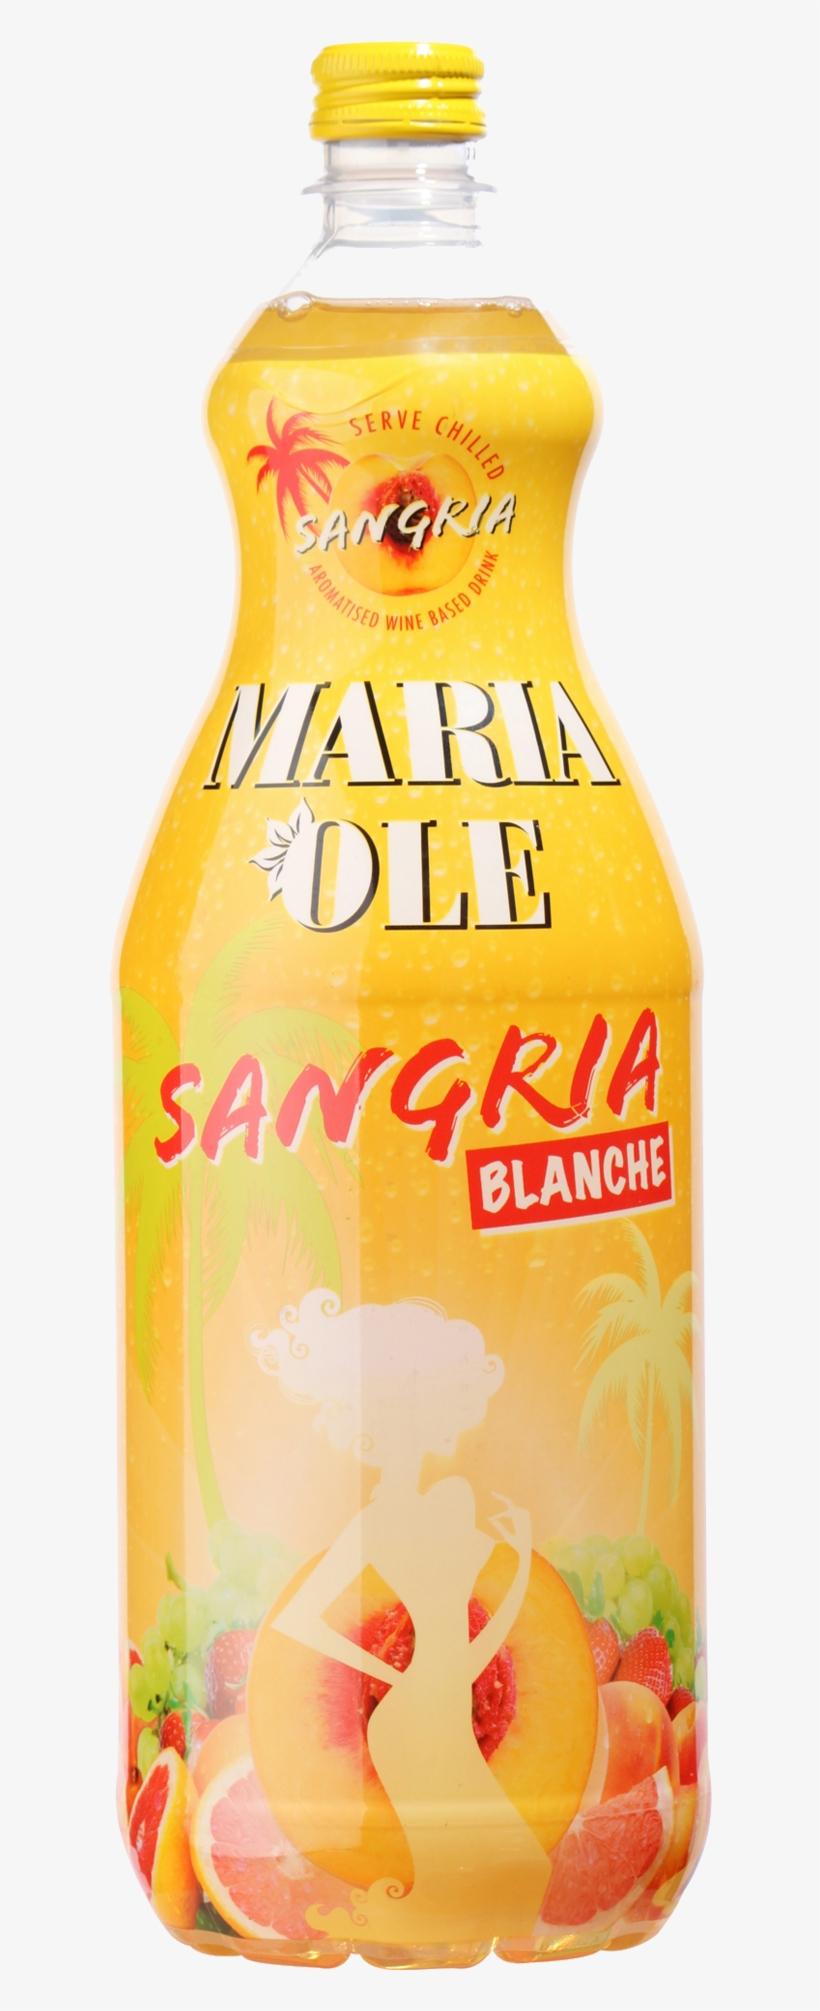 Maria Ole Sangria Blanche - Maria Ole Sangria 1,5l, transparent png #1755181